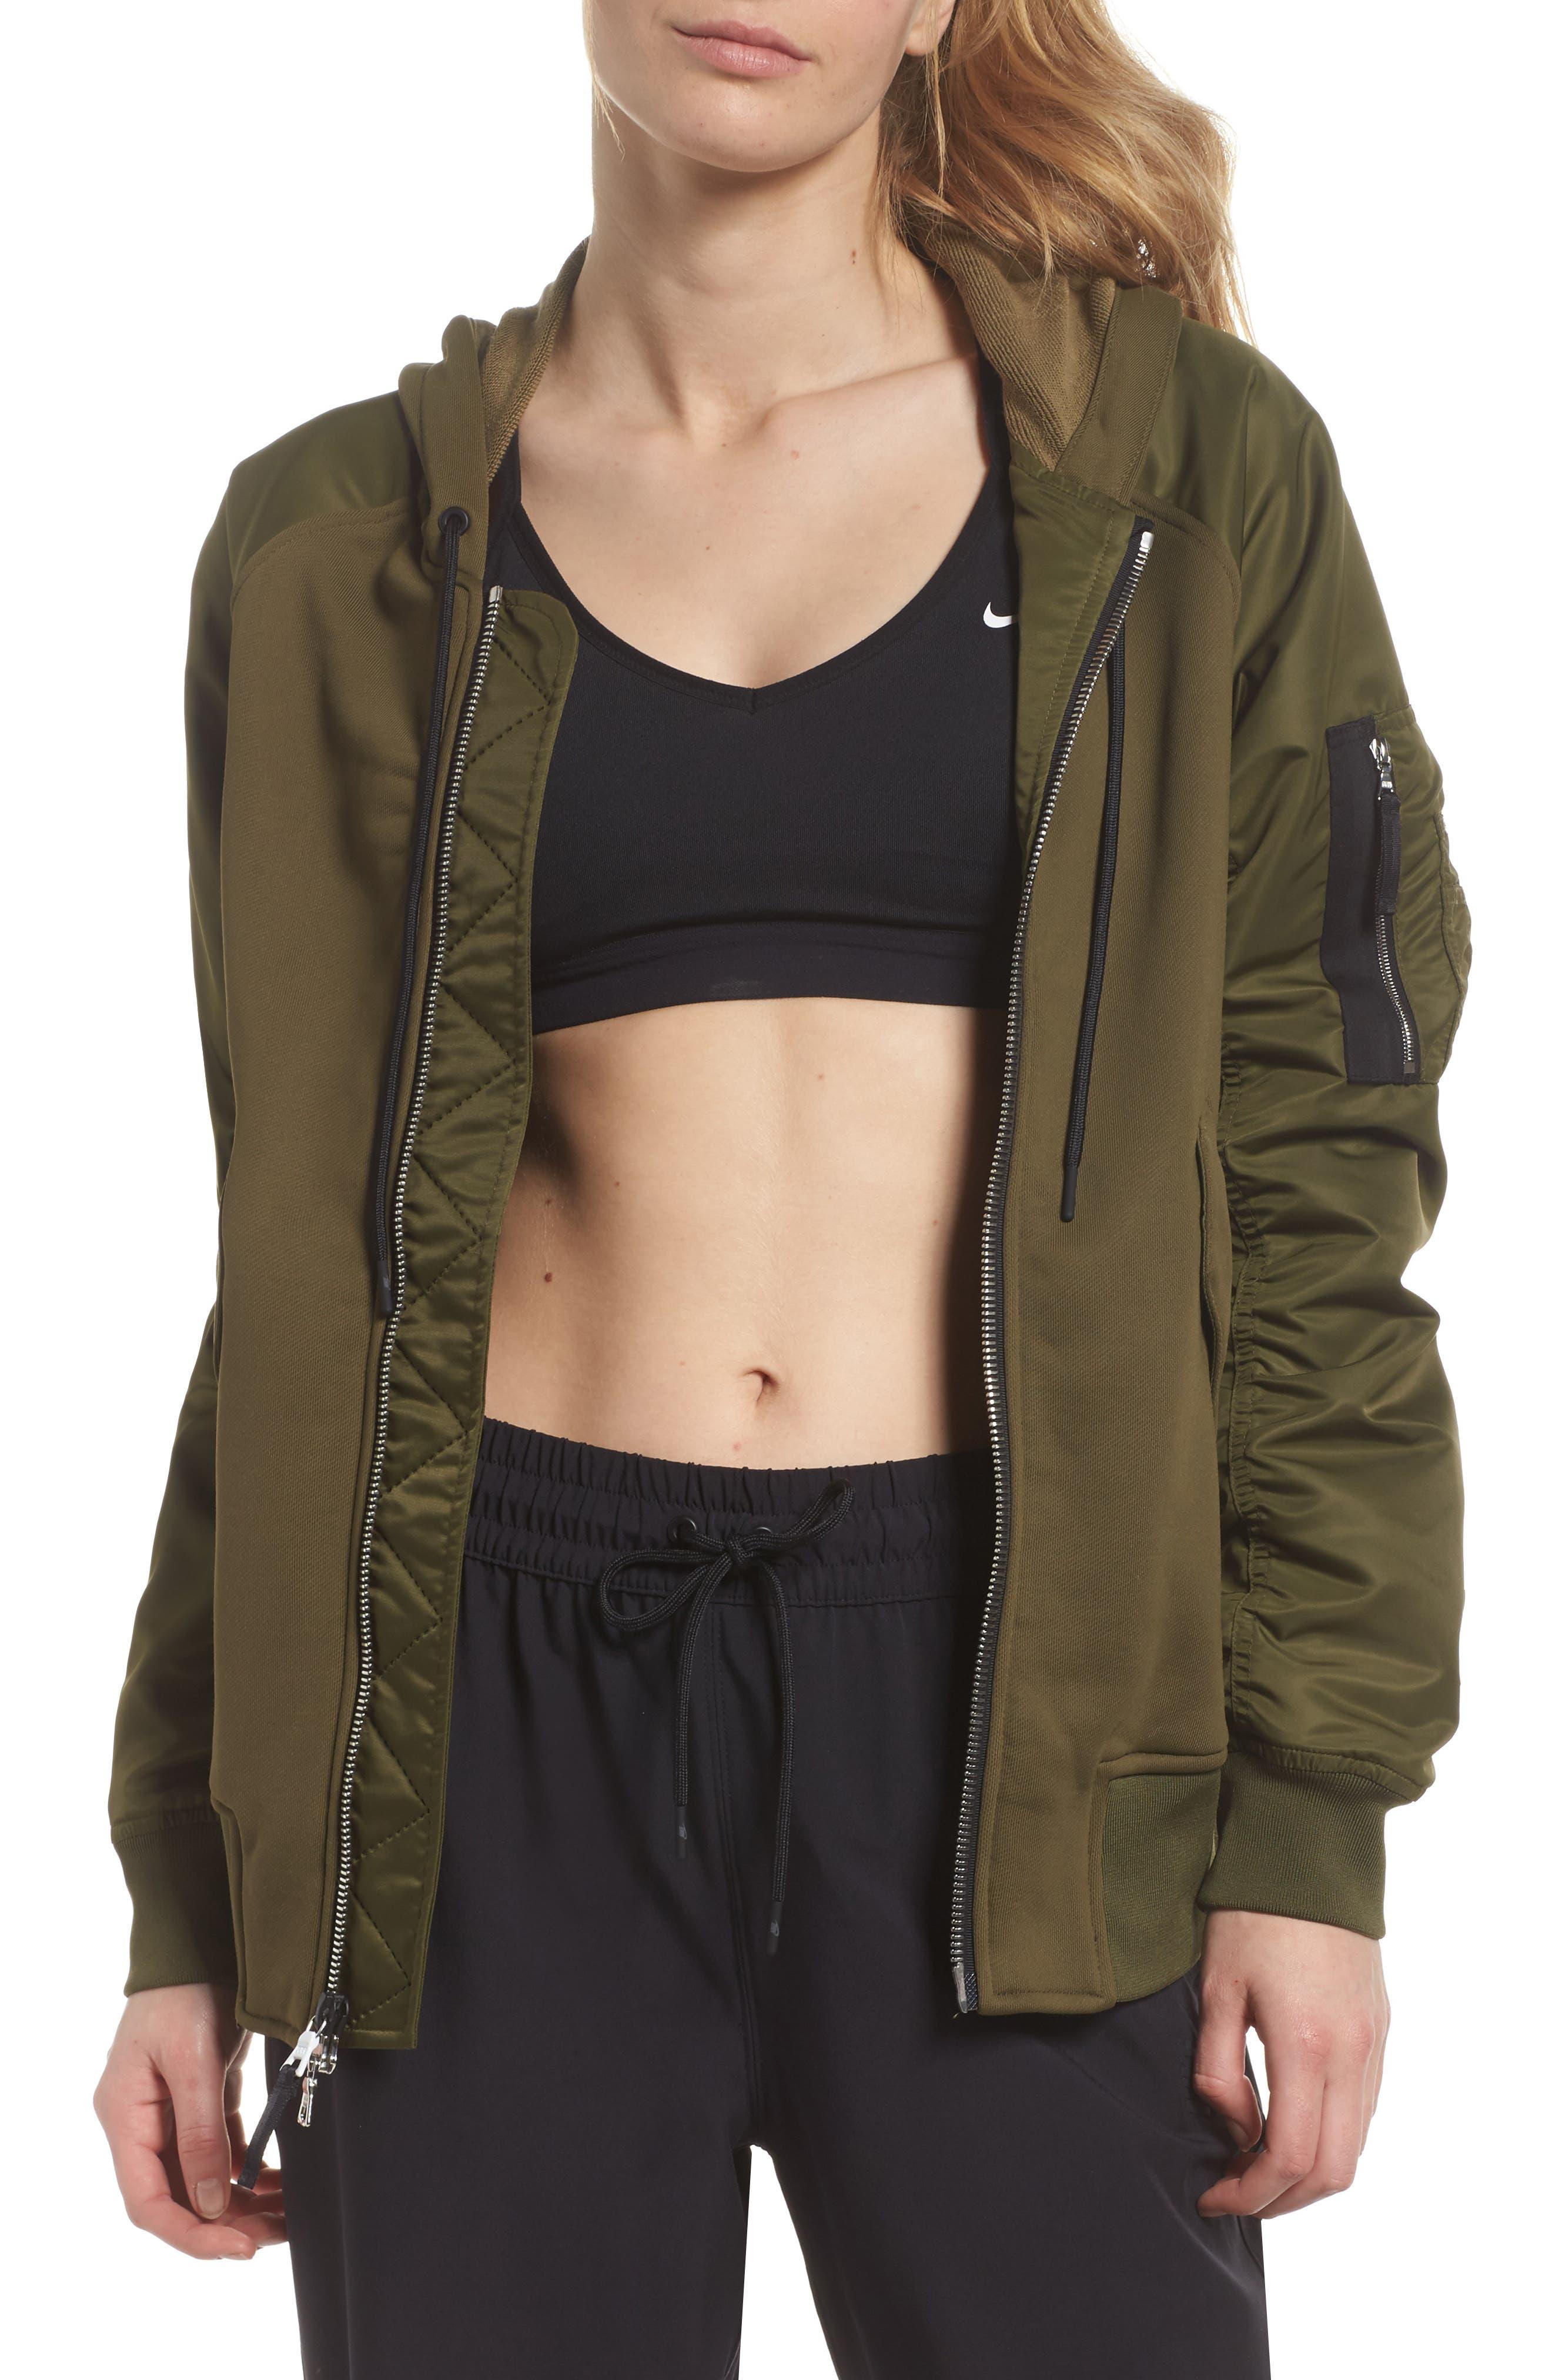 NikeLab Women's Mixed Media Bomber Jacket,                         Main,                         color, Olive Canvas/ Black